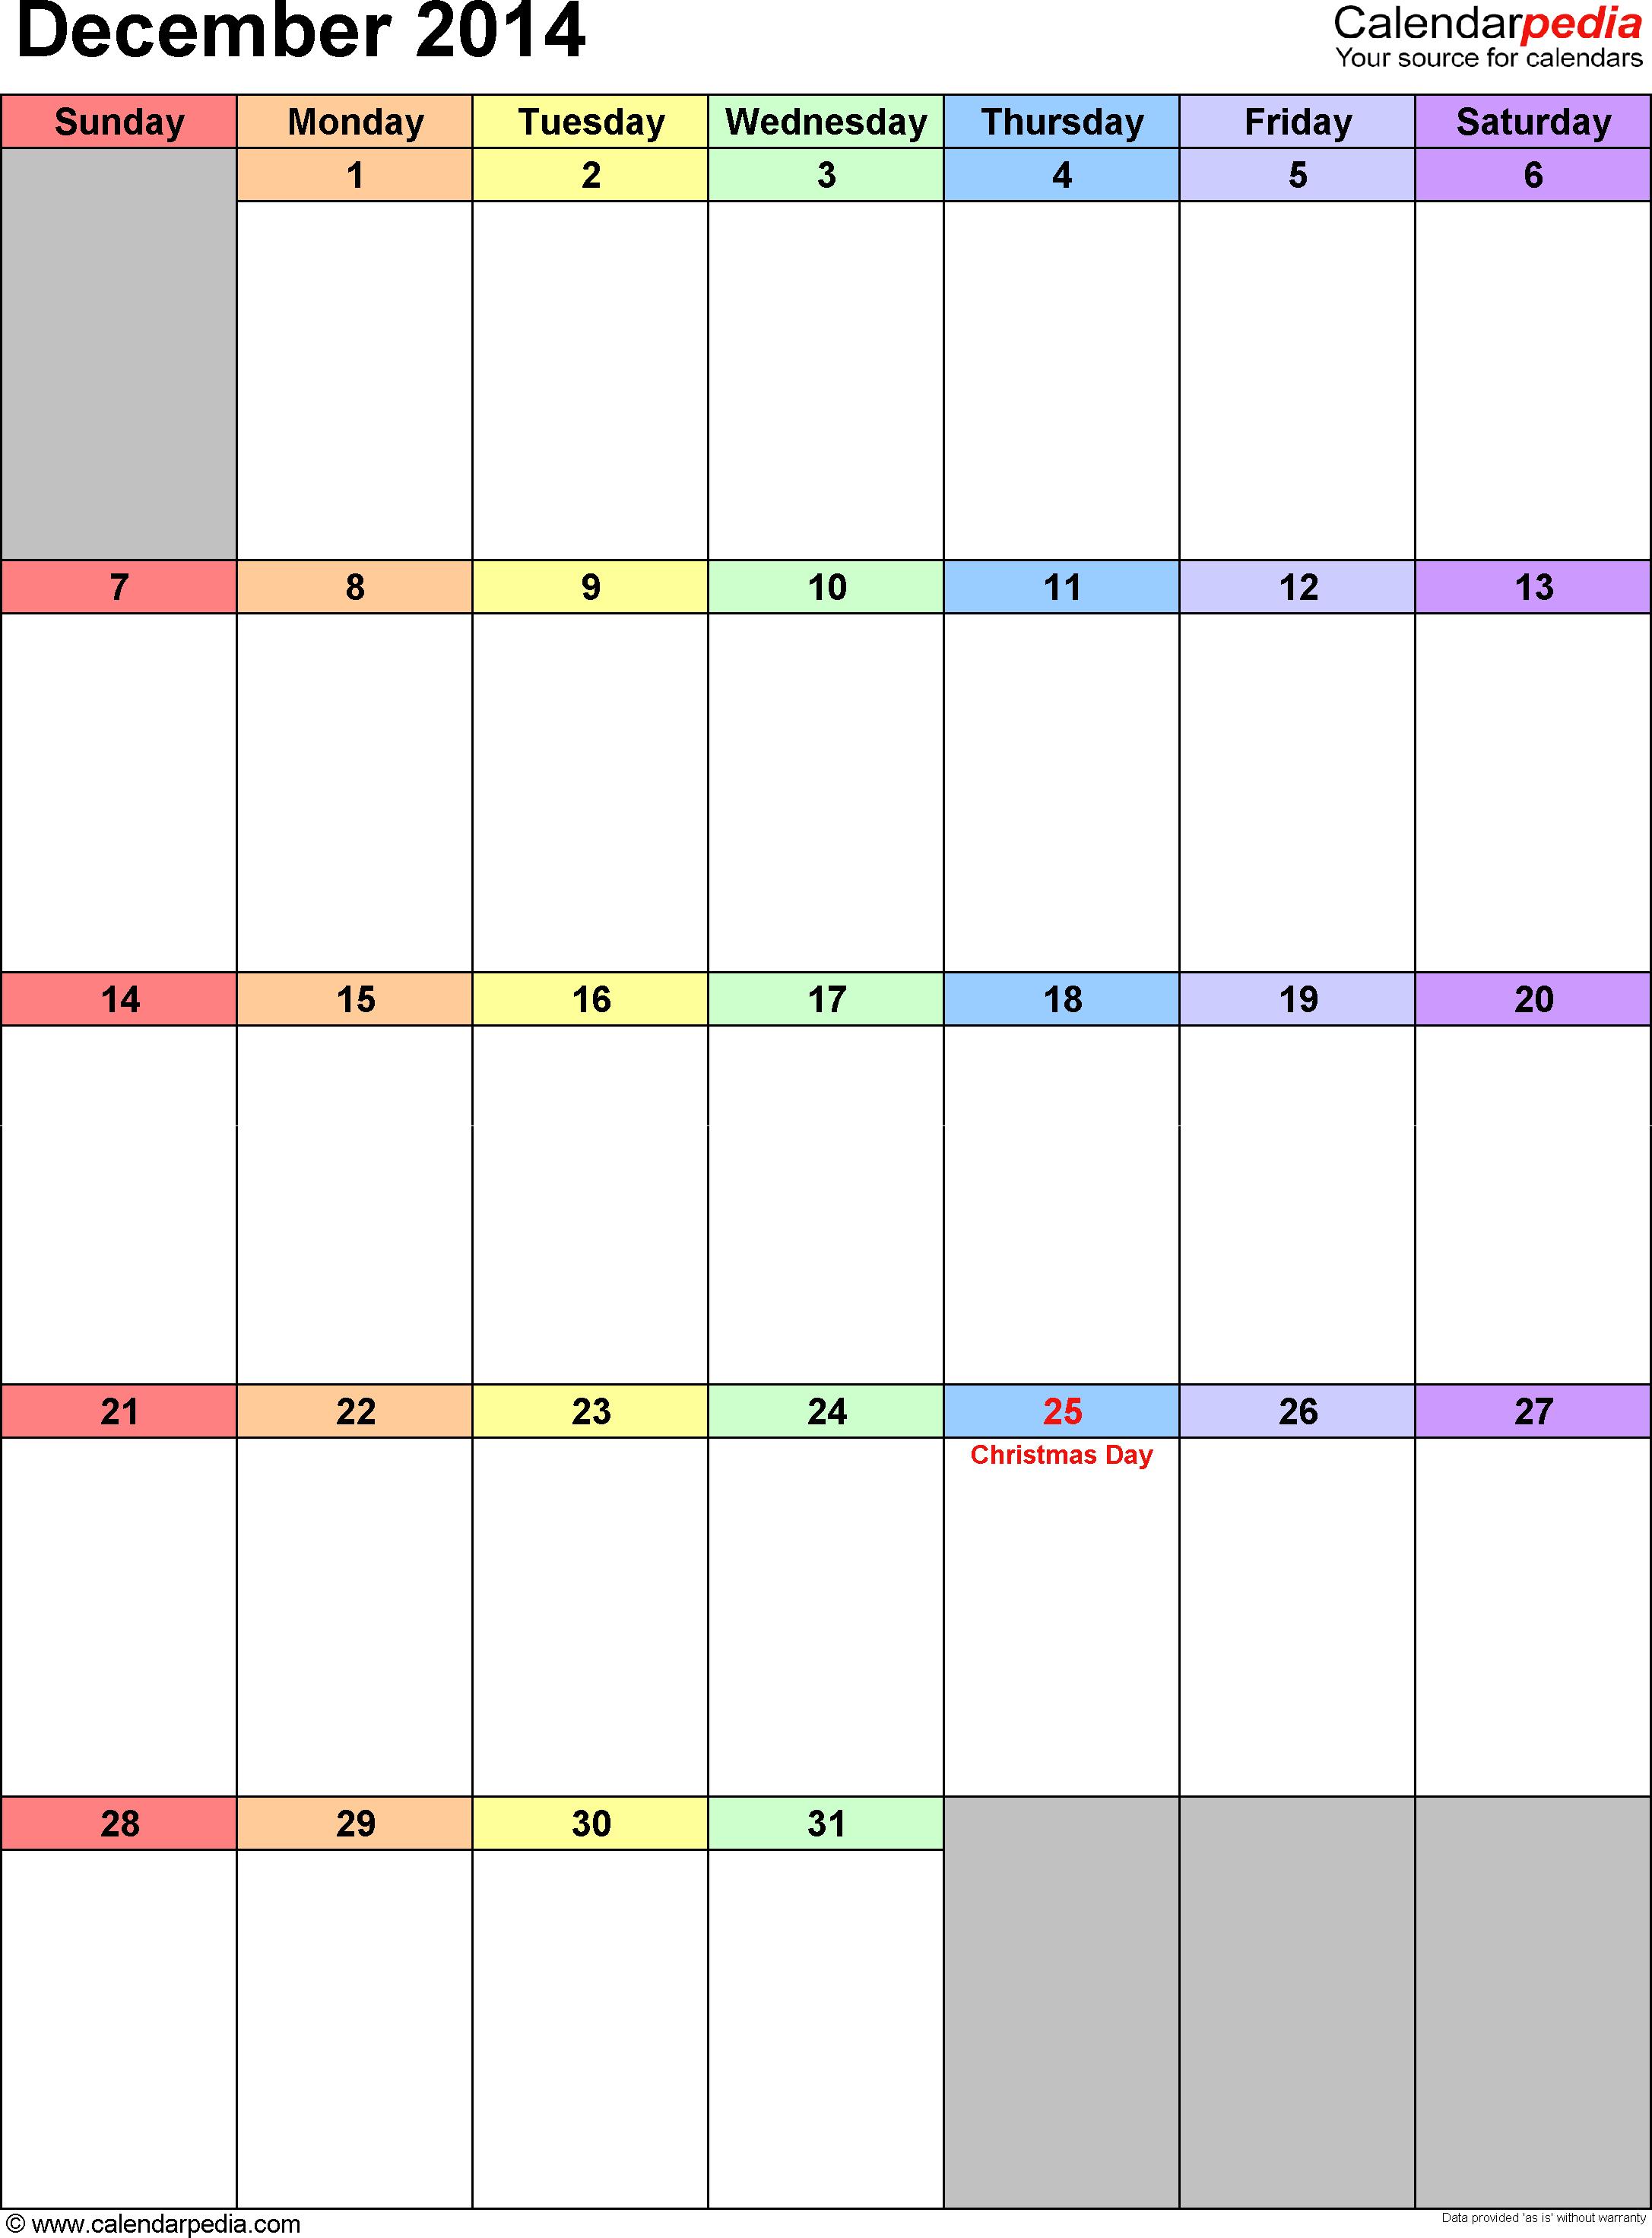 December 2014 calendar as printable Word, Excel & PDF templates